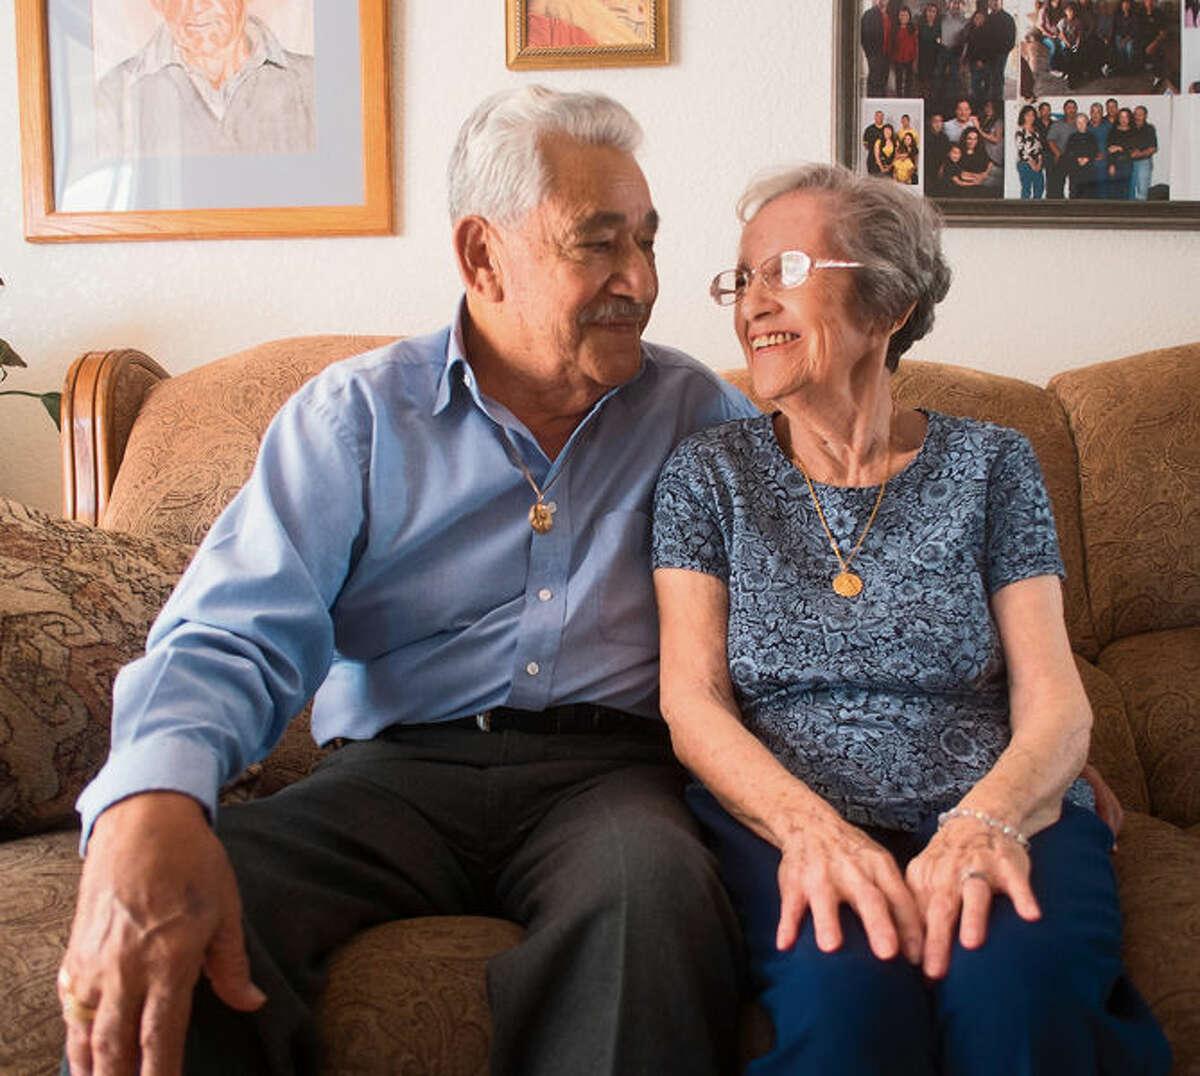 Robert and Ofelia Kirker speak at their home in Las Cruces, N.M., on May 27.